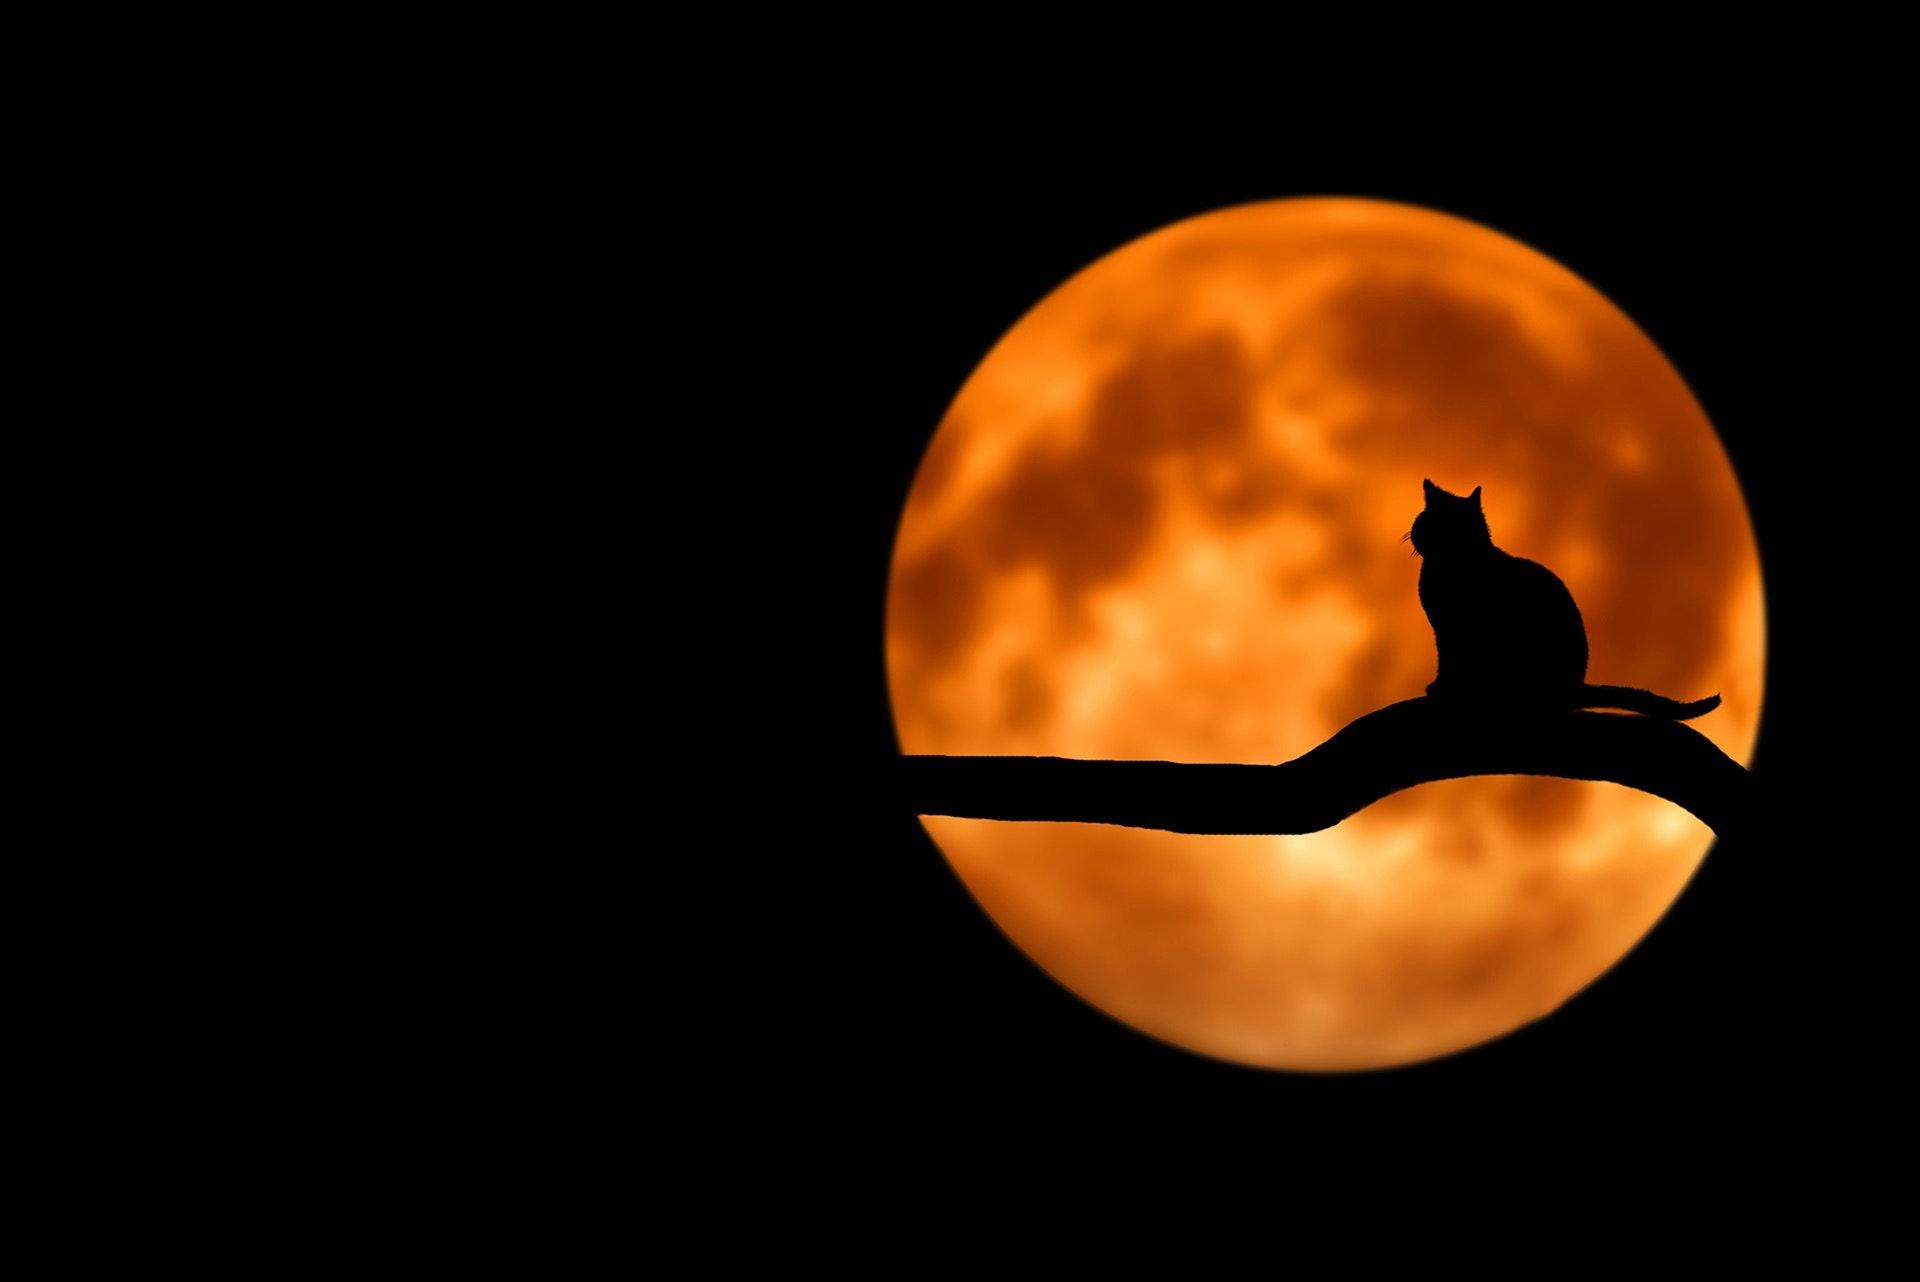 gatti neri e halloween